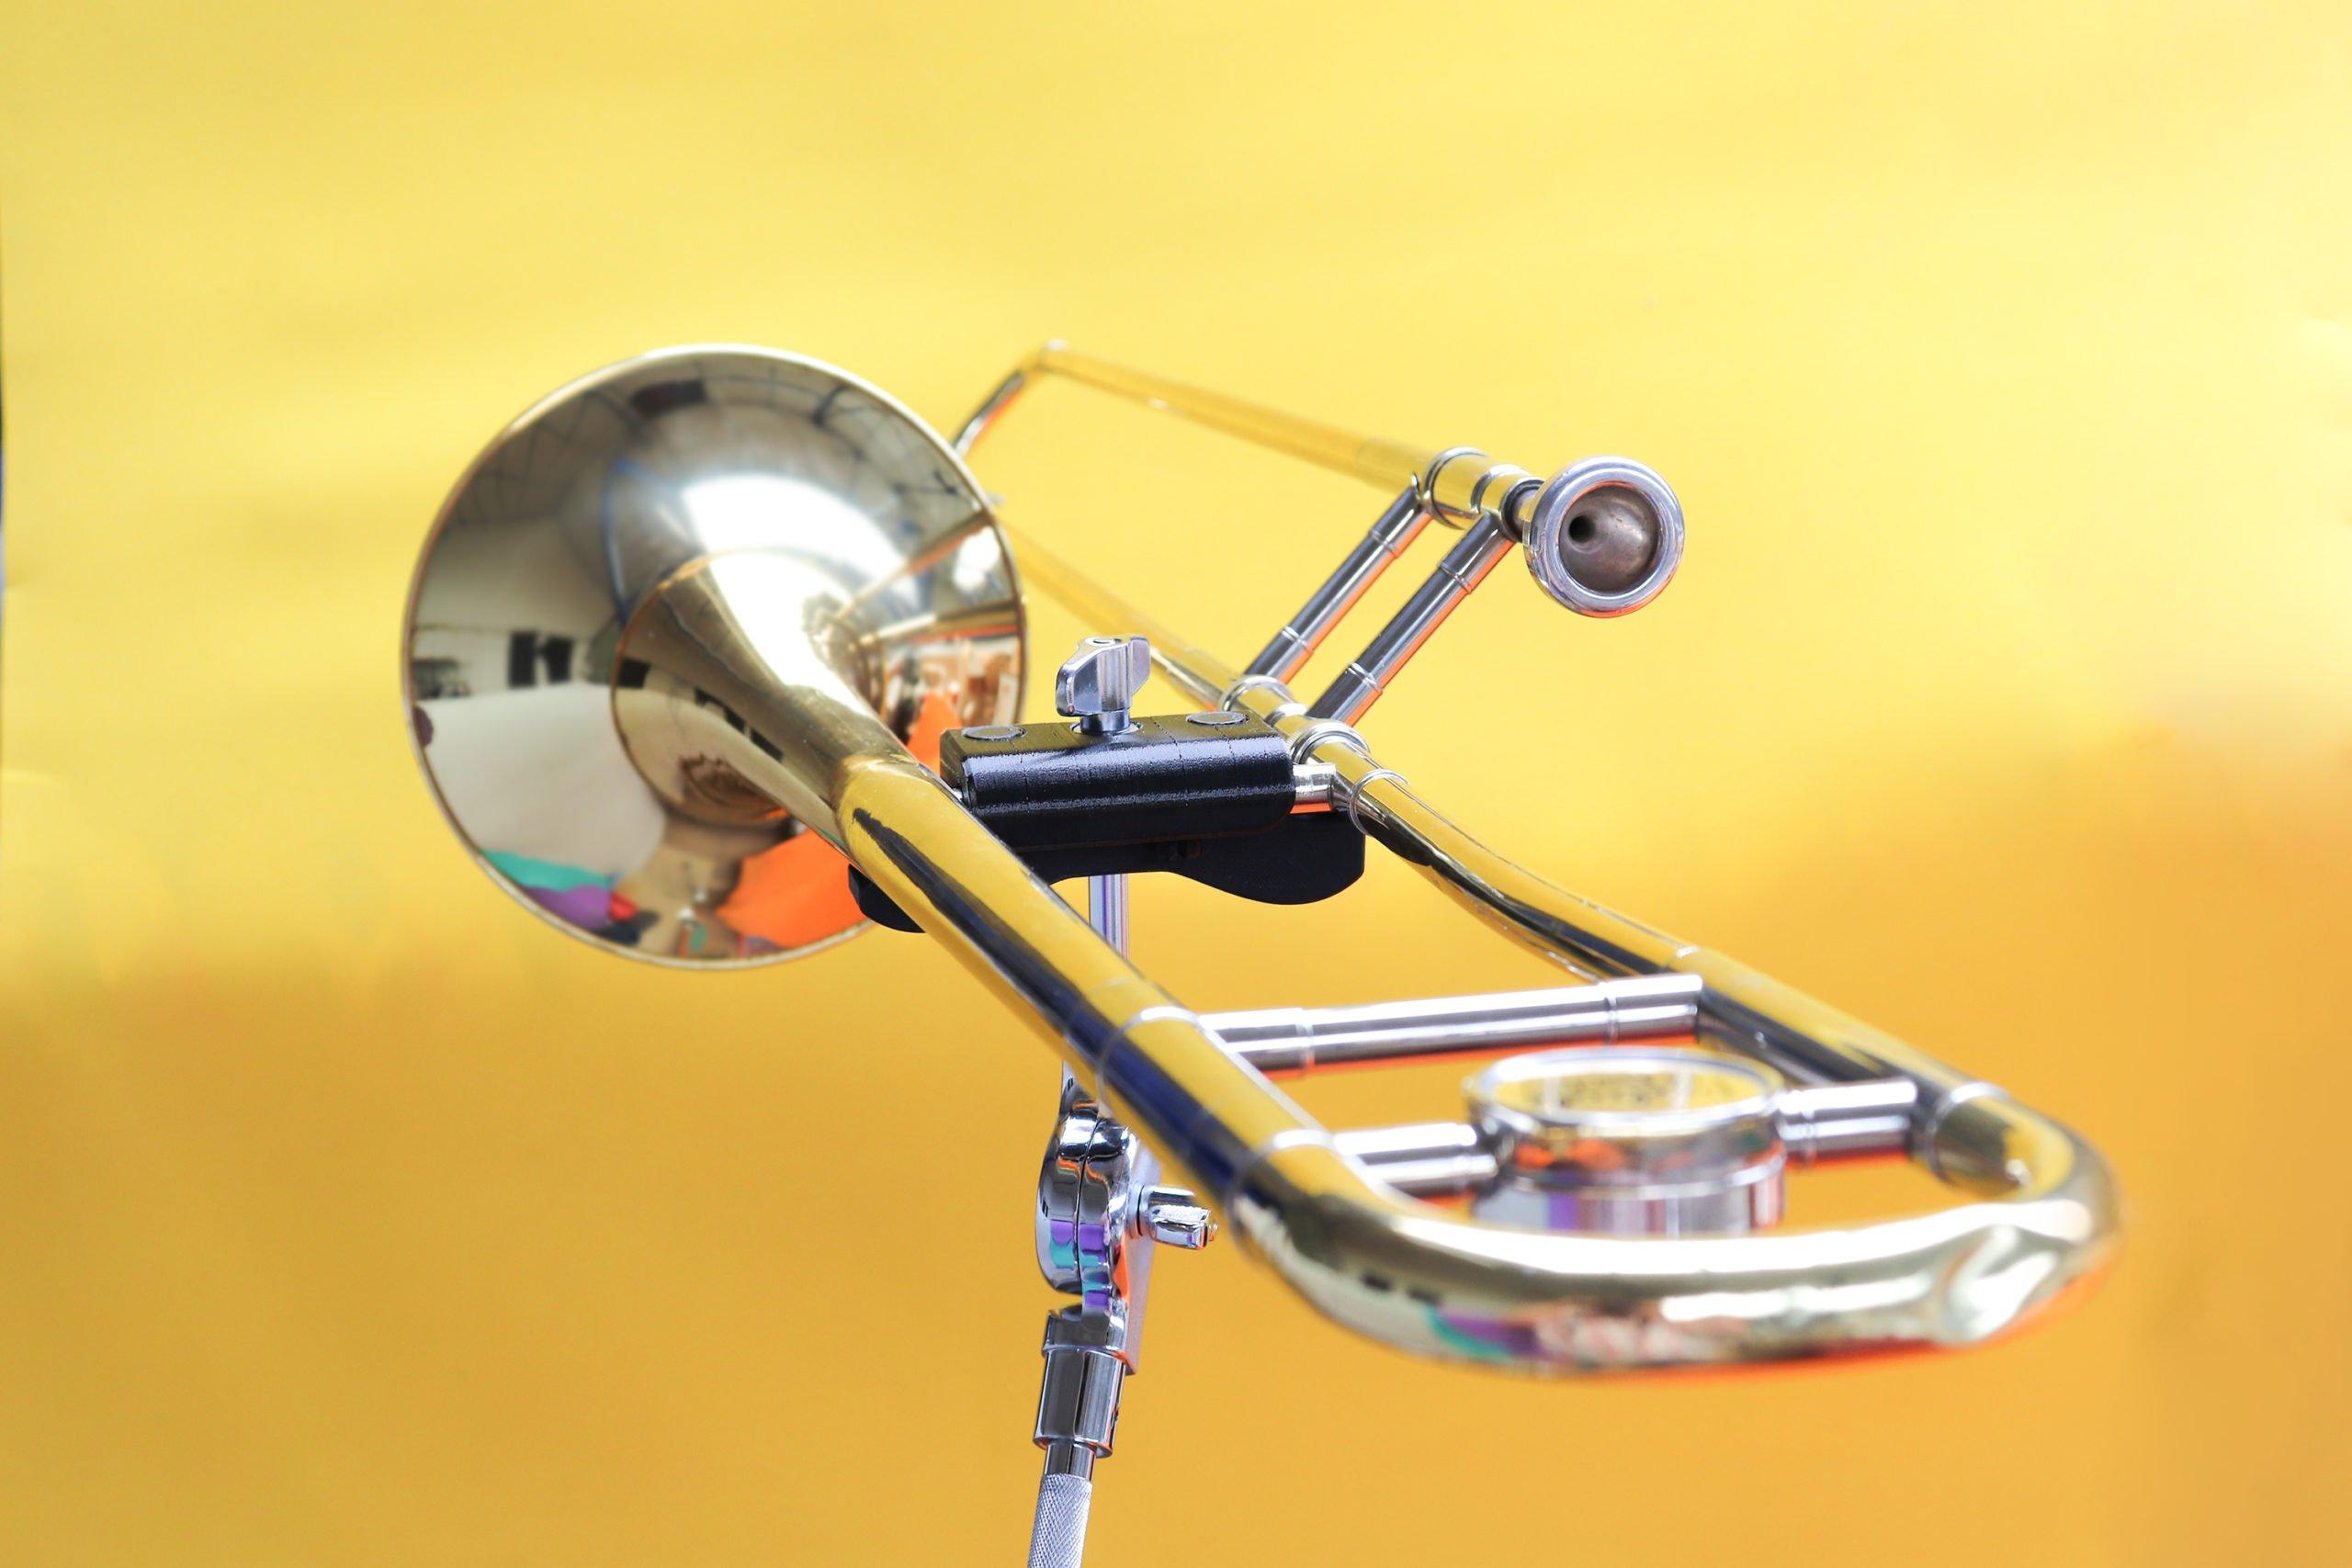 Trombone mount